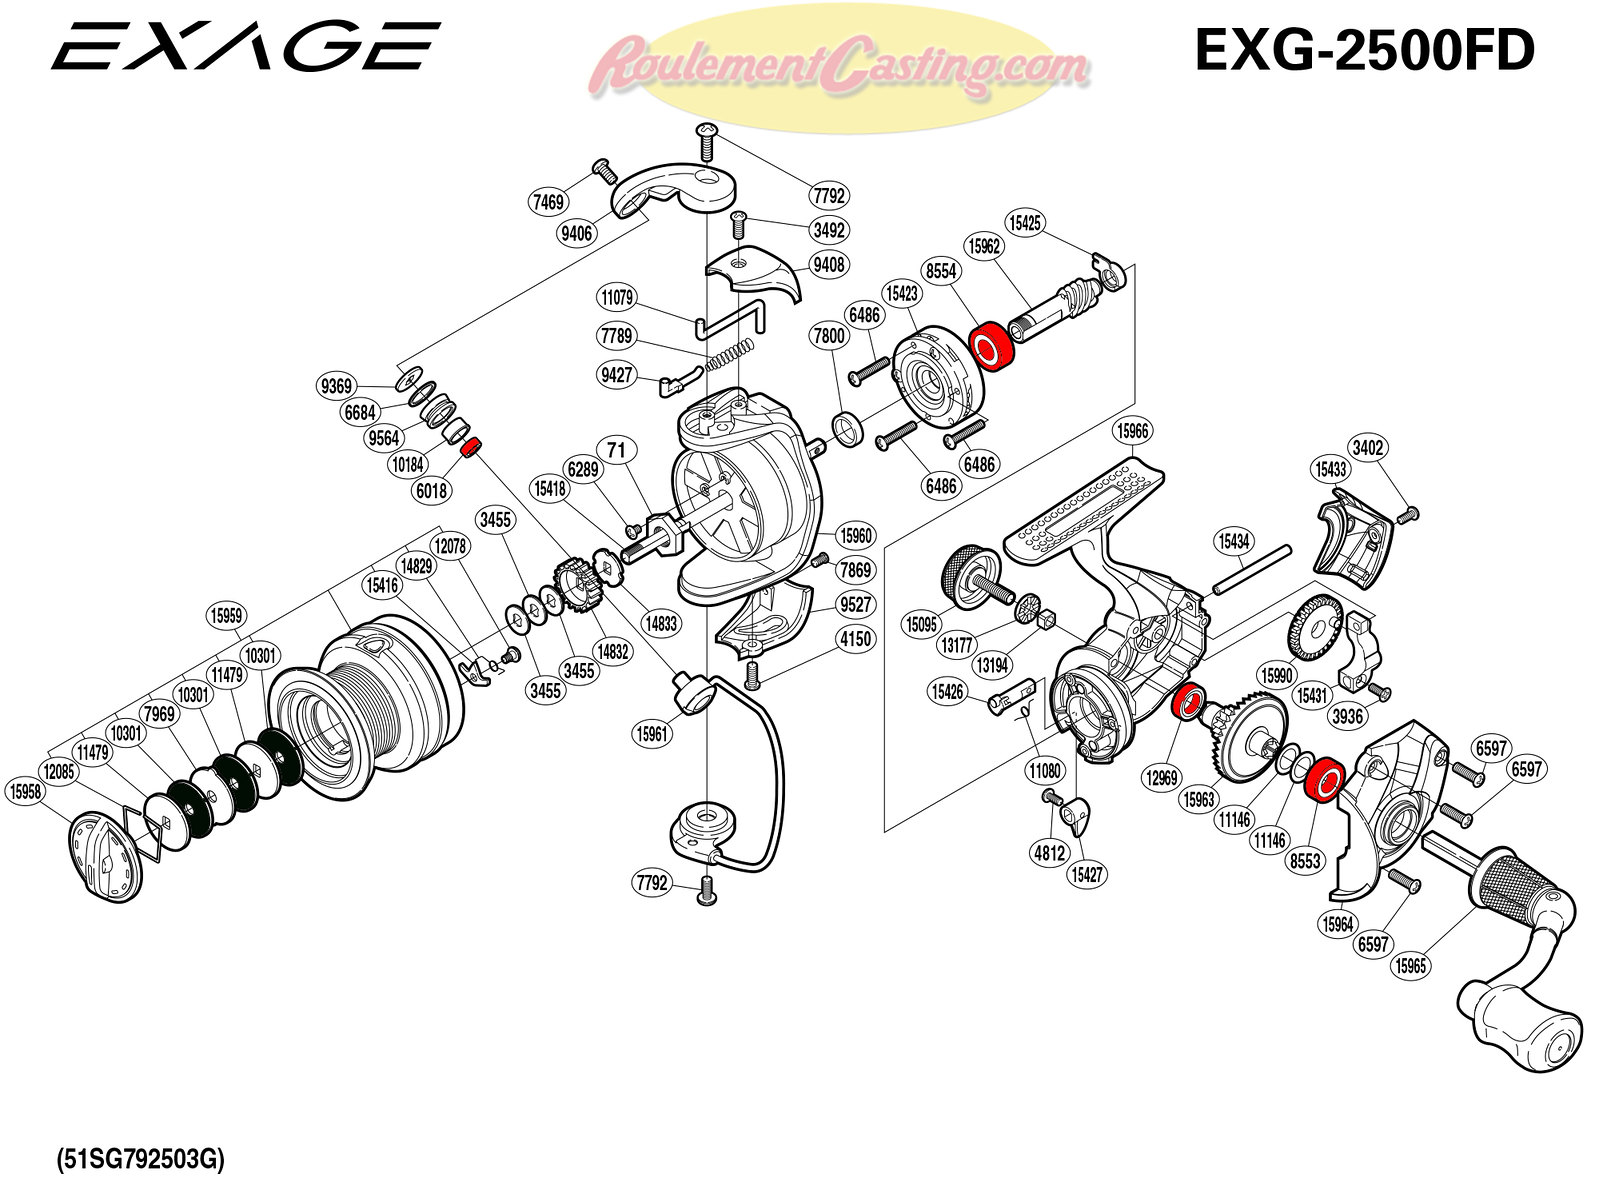 Schema-Shimano-EXAGE-2500FD